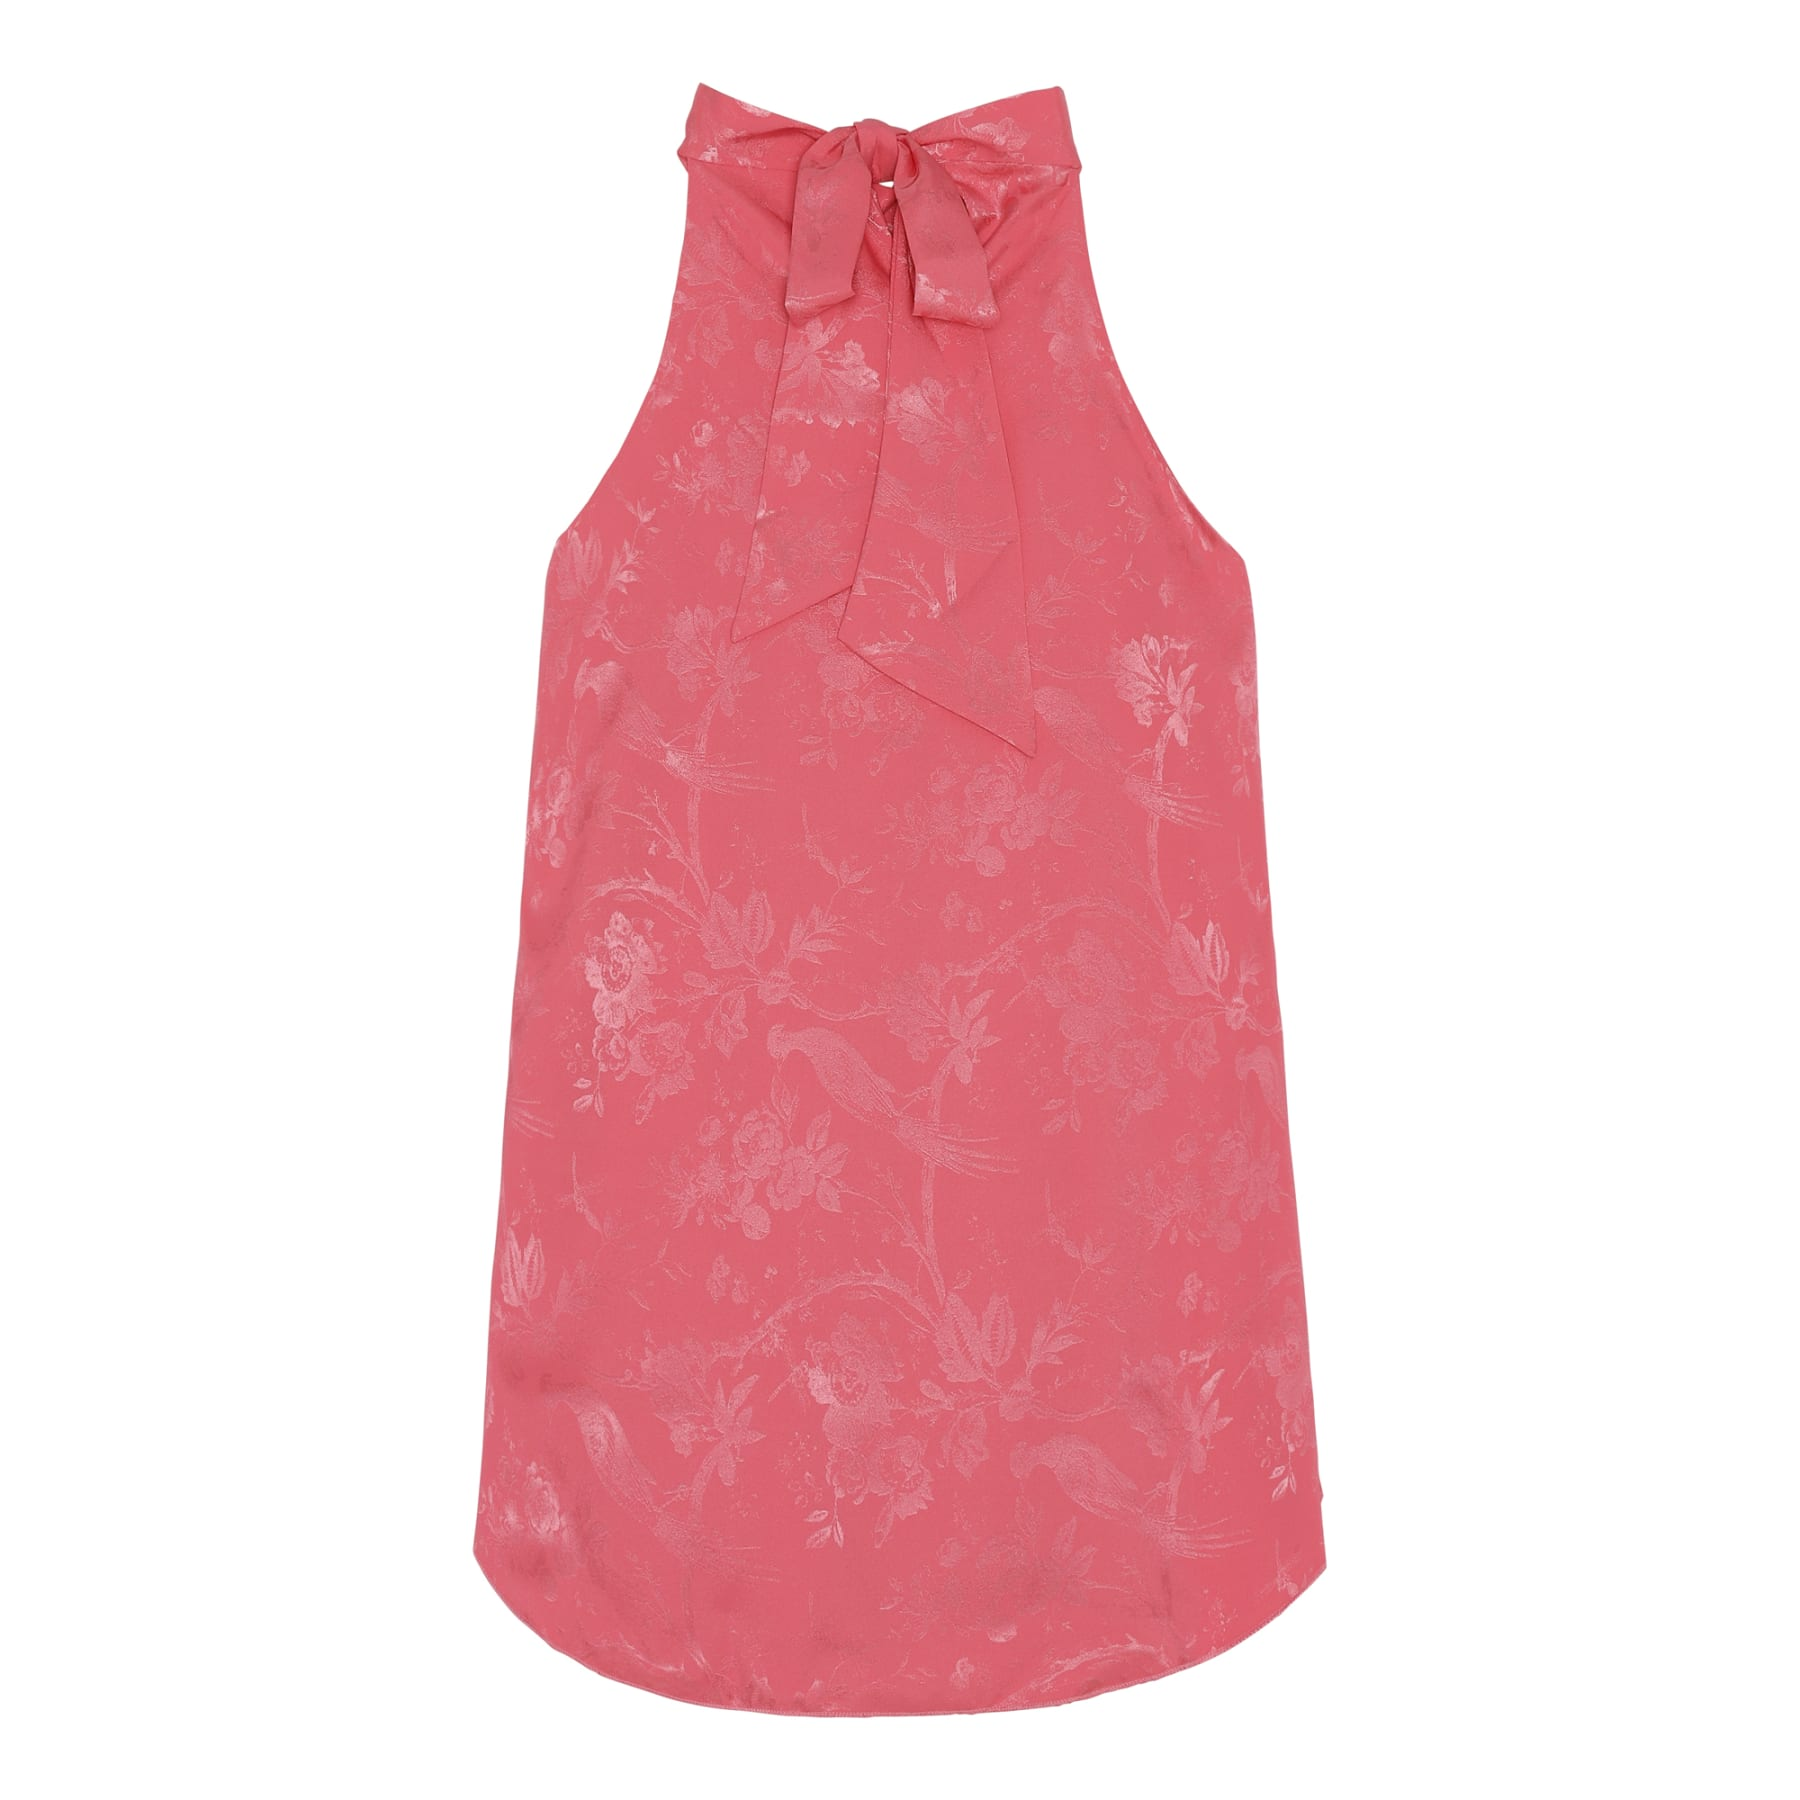 Eloise Top - Provence Jacquard Pink 1